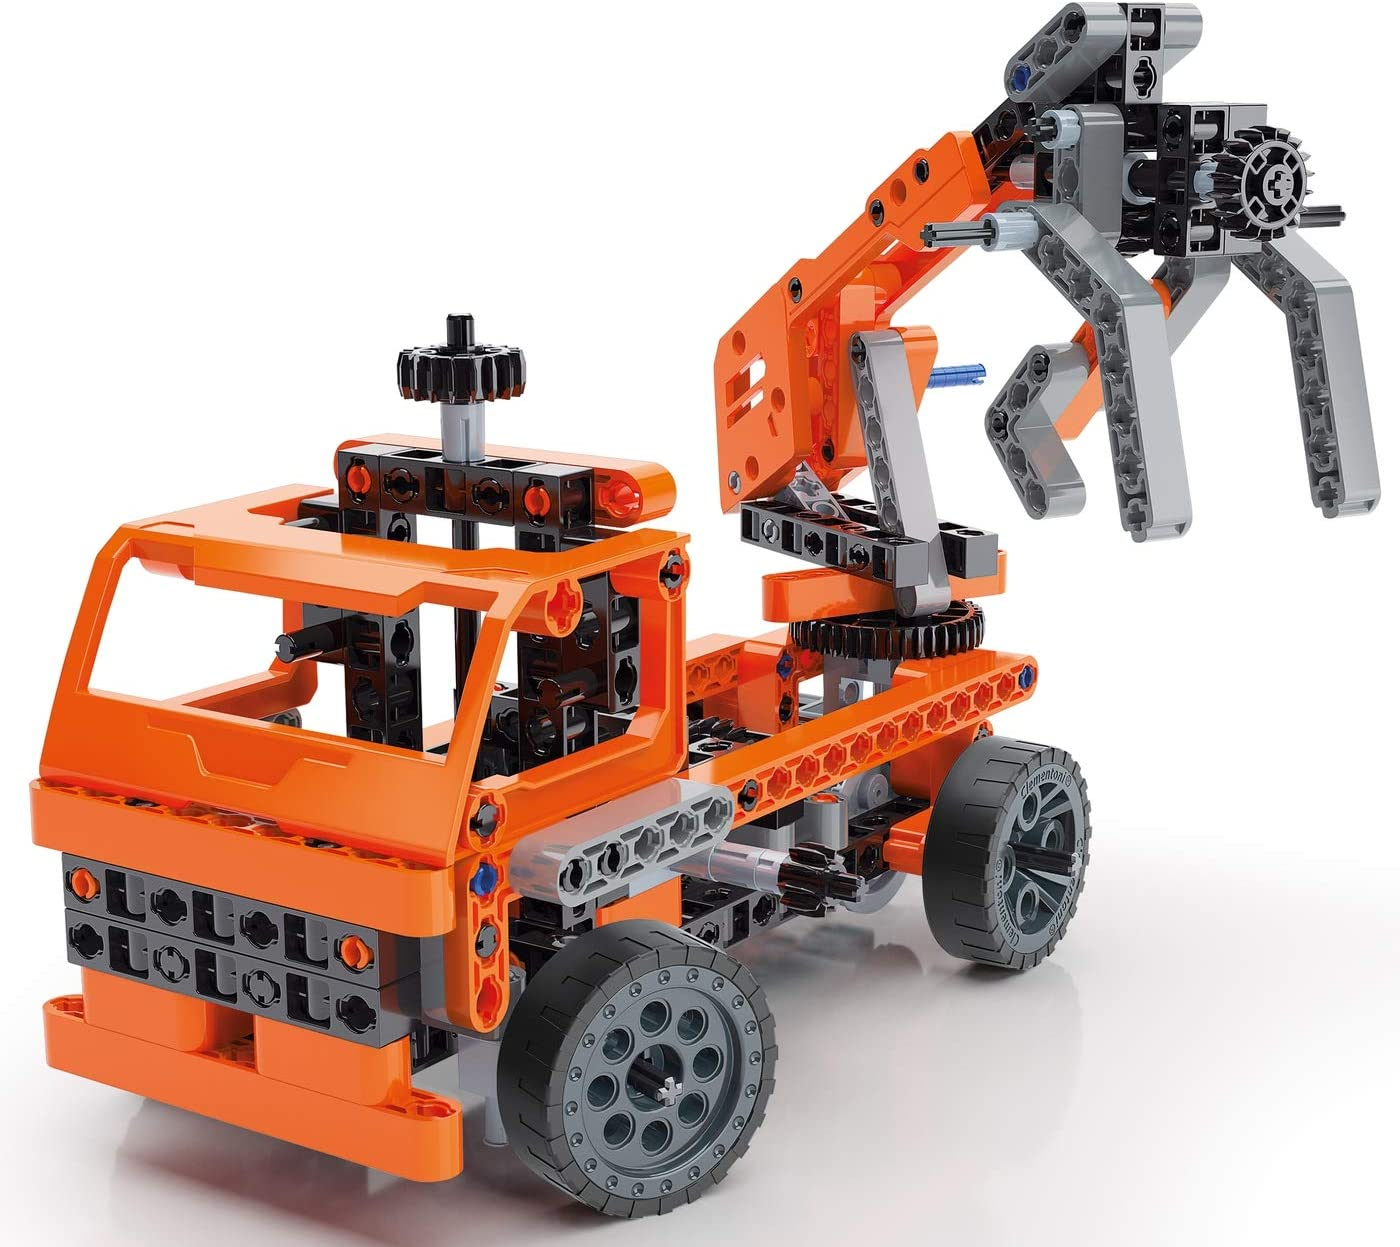 50 Model Configurations Ages 8 and Up Lifting Equipment Assembly Kit Clementoni Technologic Mechanics Laboratory